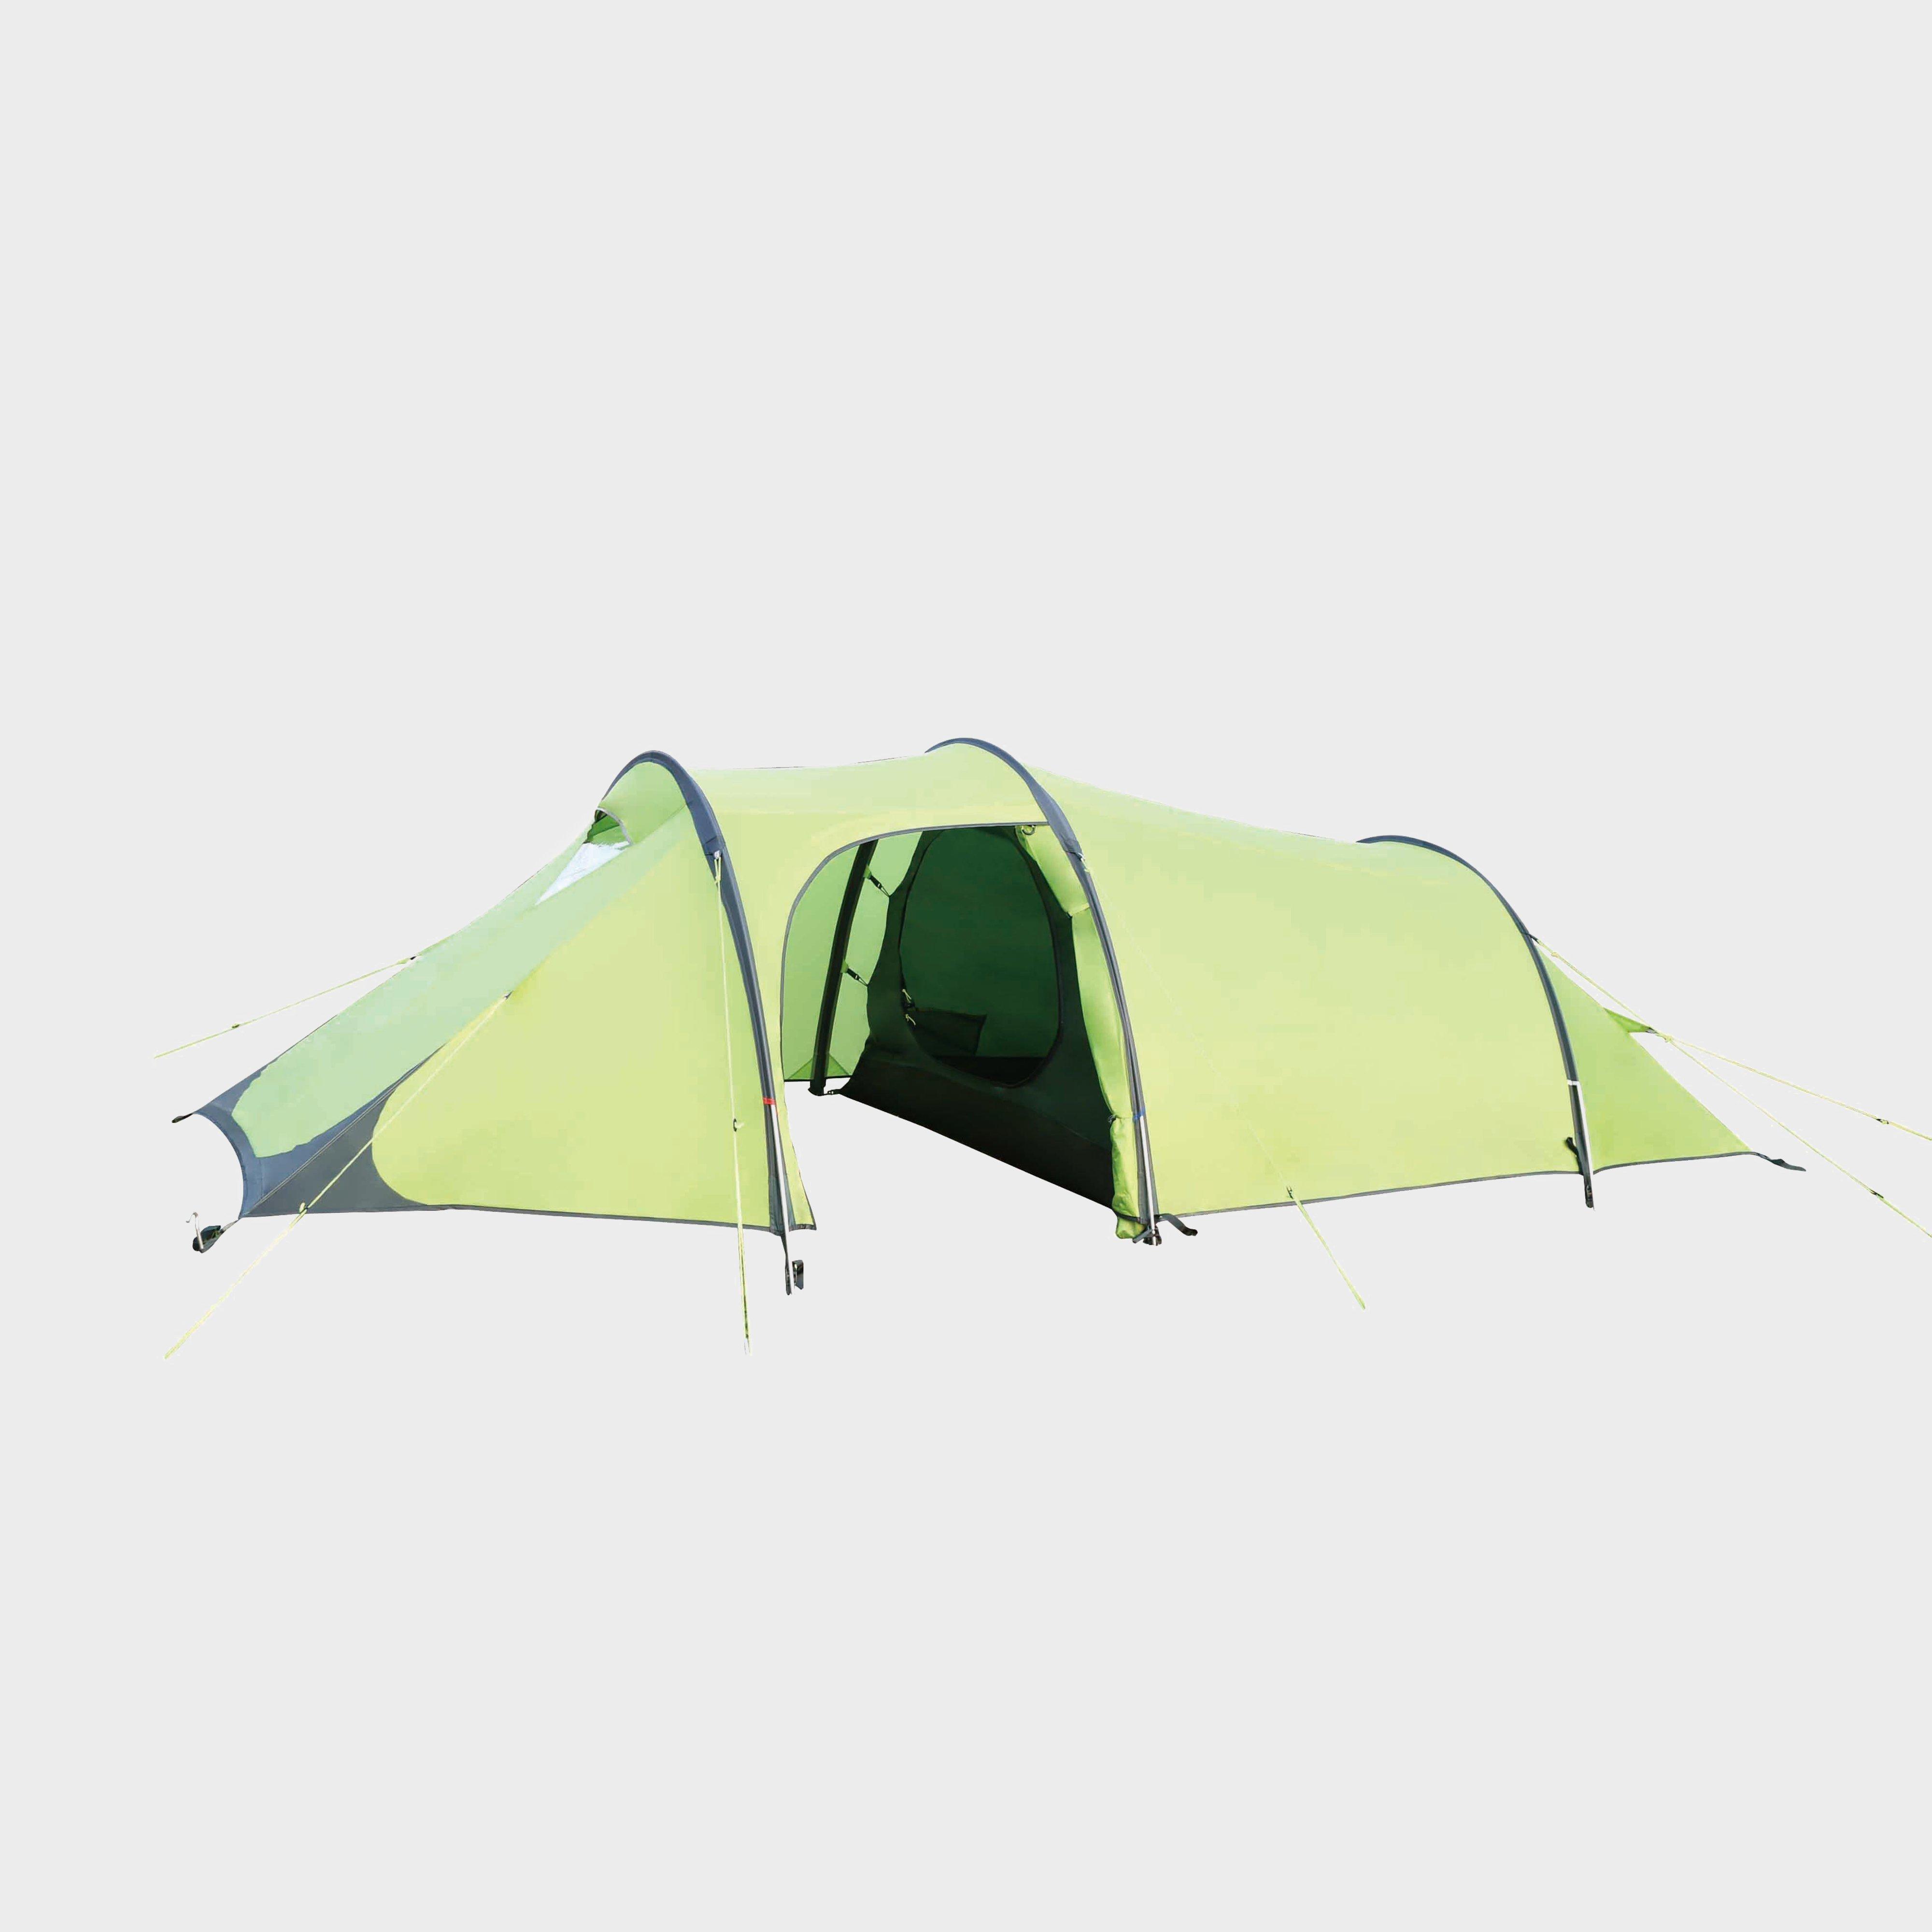 BERGHAUS Peak 3.3 Pro 3 Man Tent  sc 1 st  Blacks & Backpacking Tents | Blacks